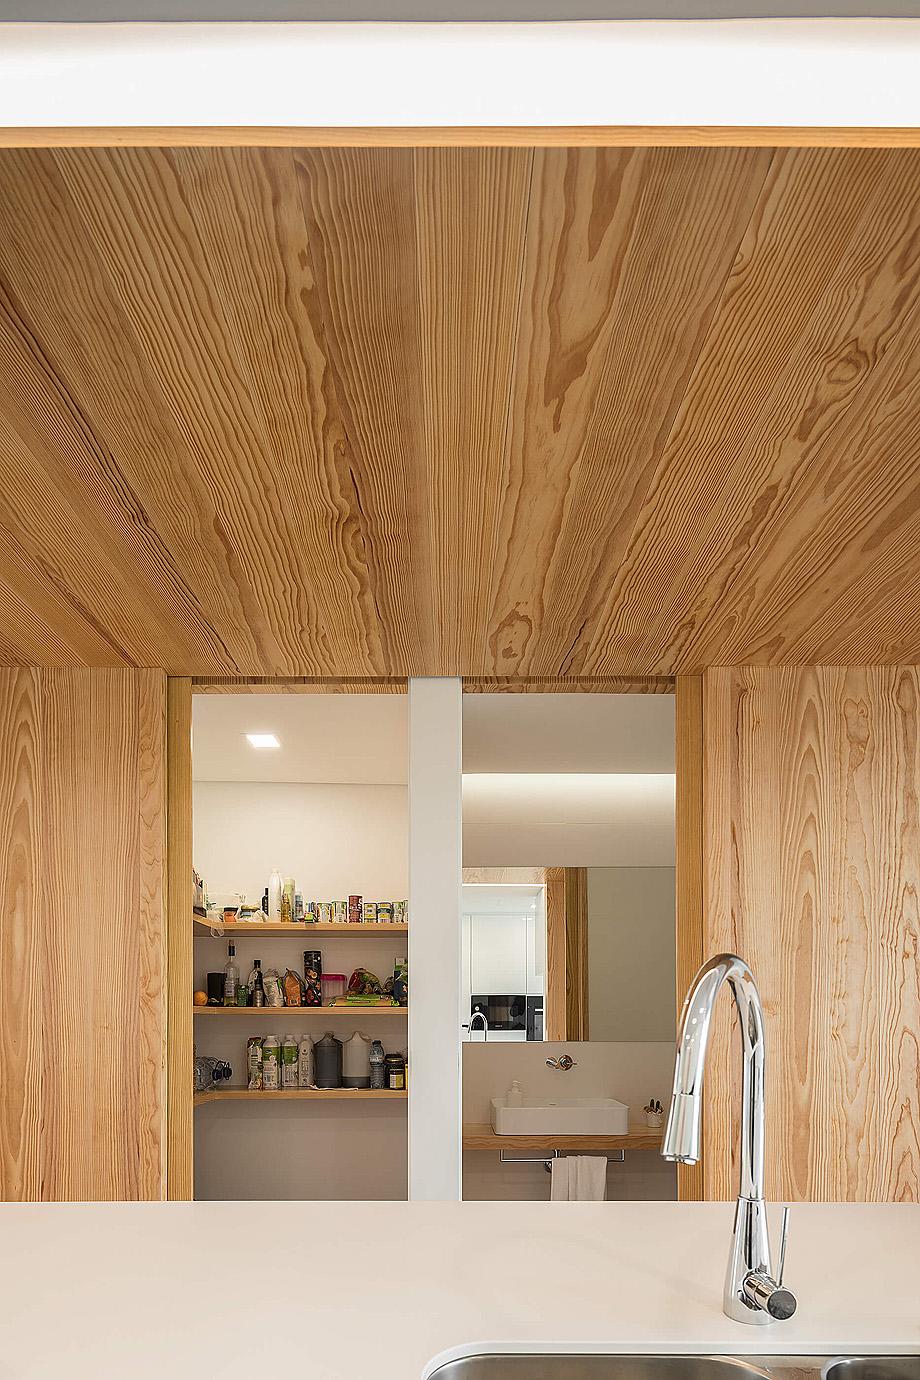 casa do arco de frari architecture network - foto ivo tavares (18)